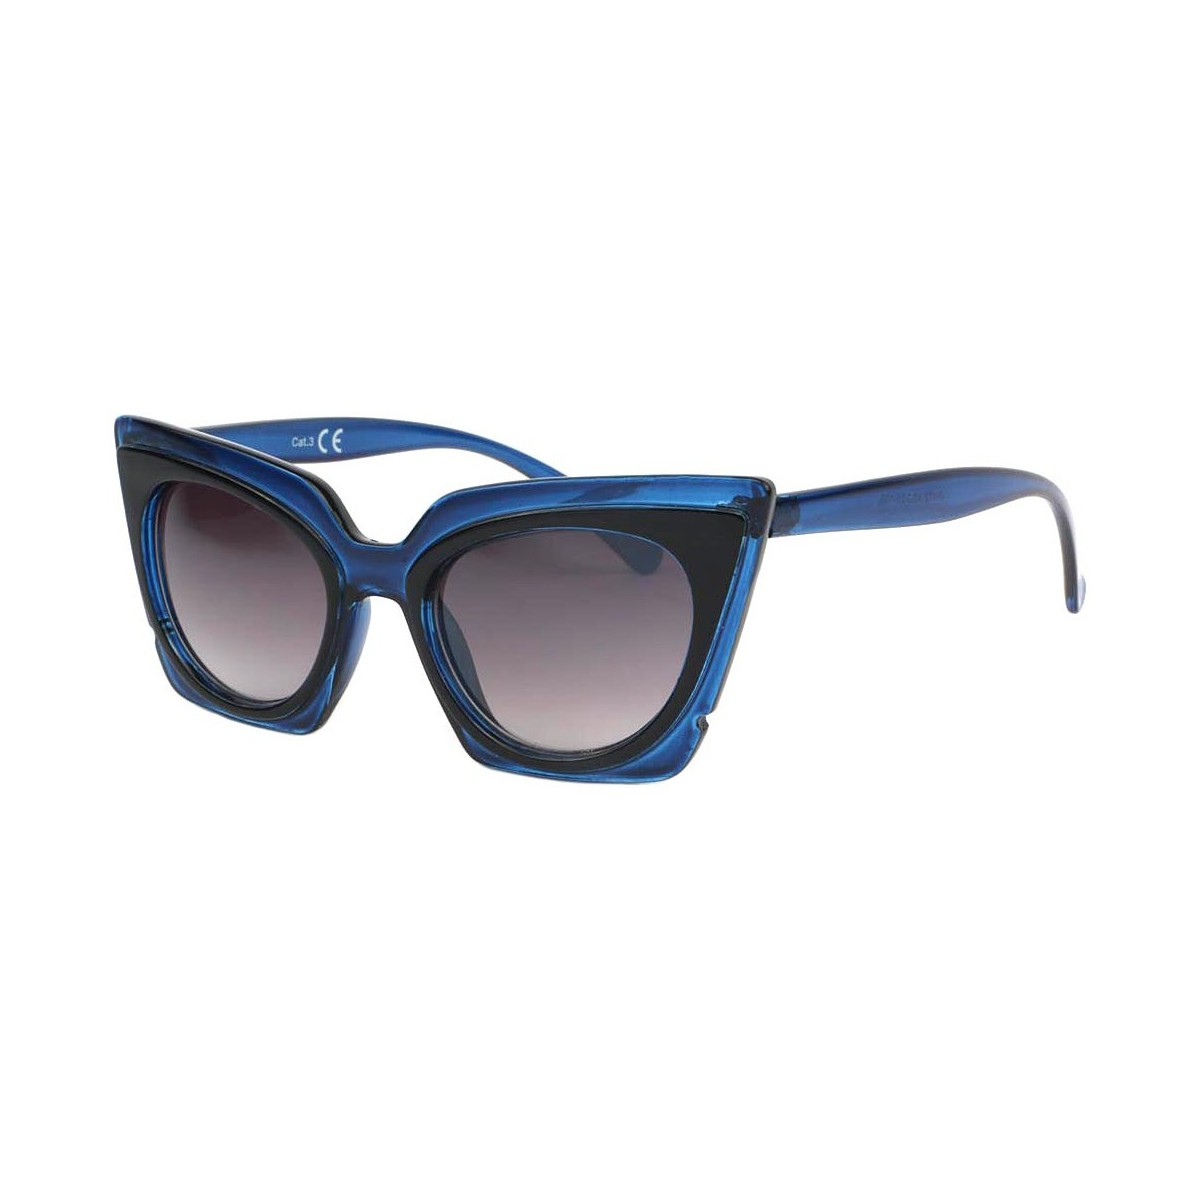 Eye Wear Lunettes de soleil Papillon Bleu Feline Bleu